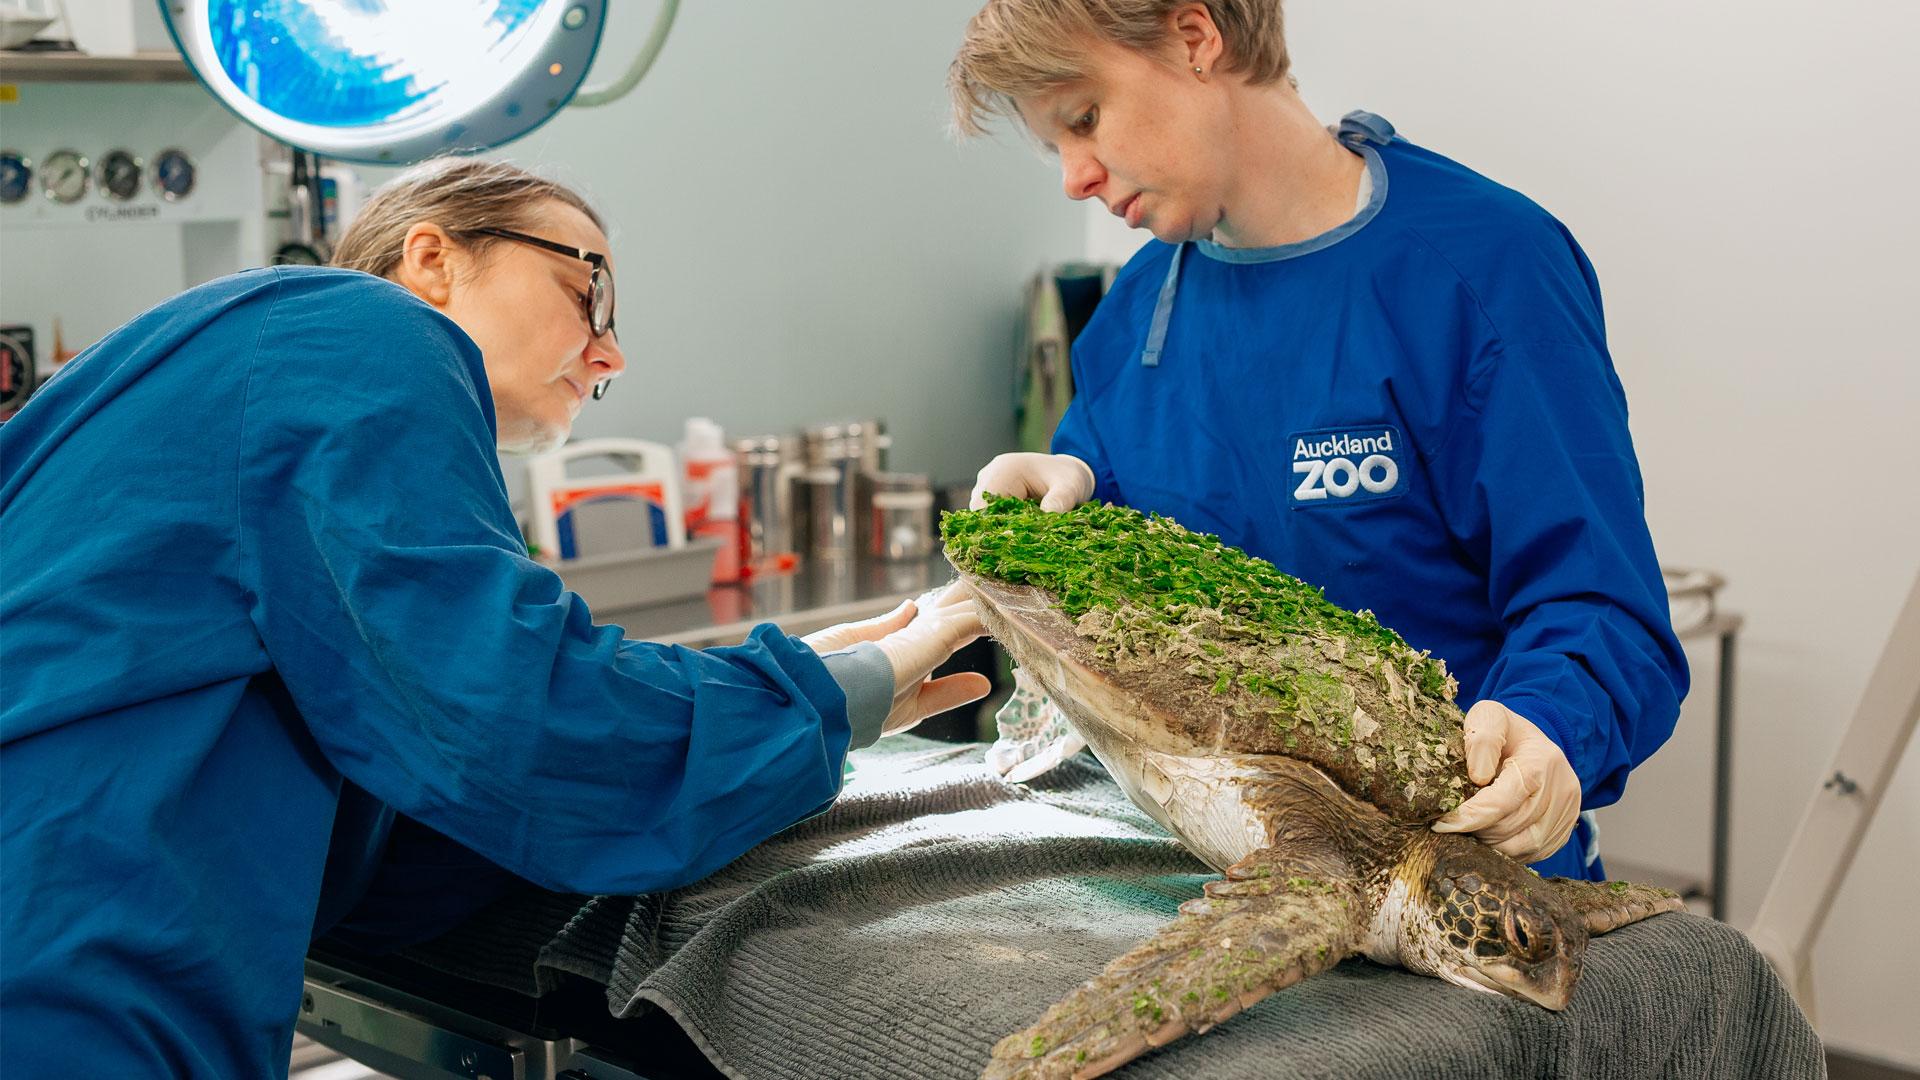 https://rfacdn.nz/zoo/assets/media/green-sea-turtle-an-gallery-4.jpg